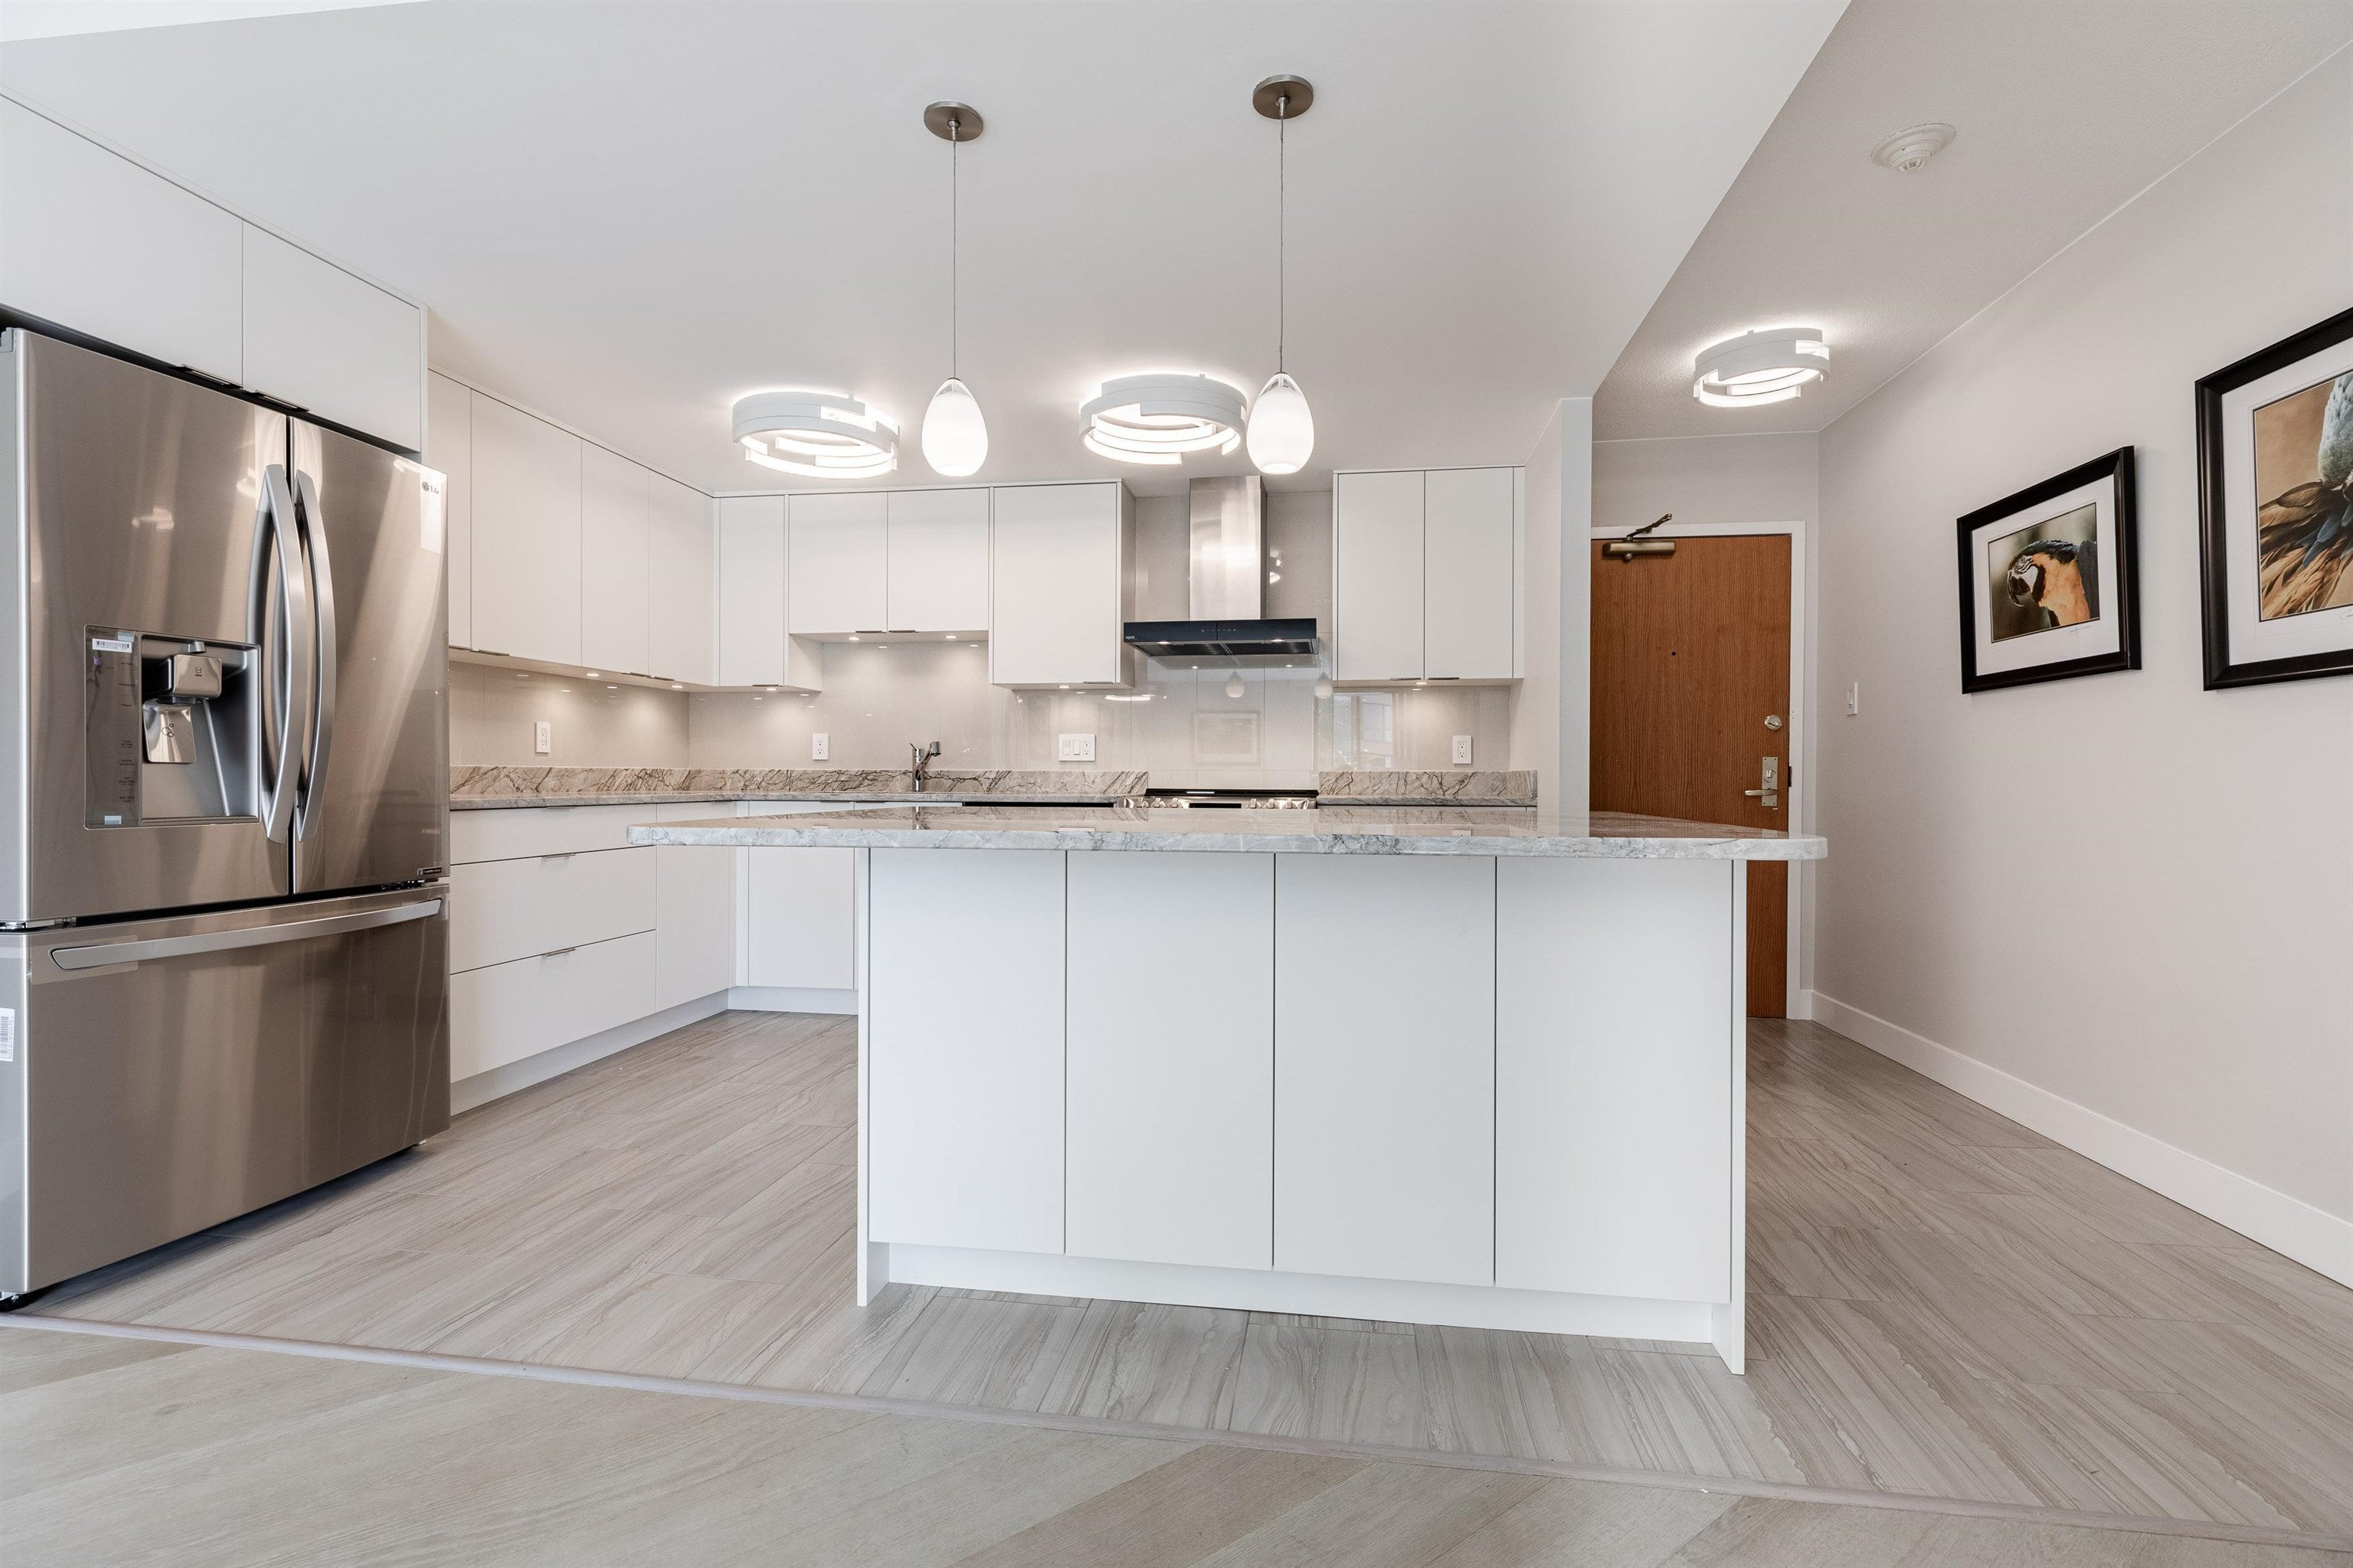 406 1450 PENNYFARTHING DRIVE - False Creek Apartment/Condo for sale, 2 Bedrooms (R2617259) - #13